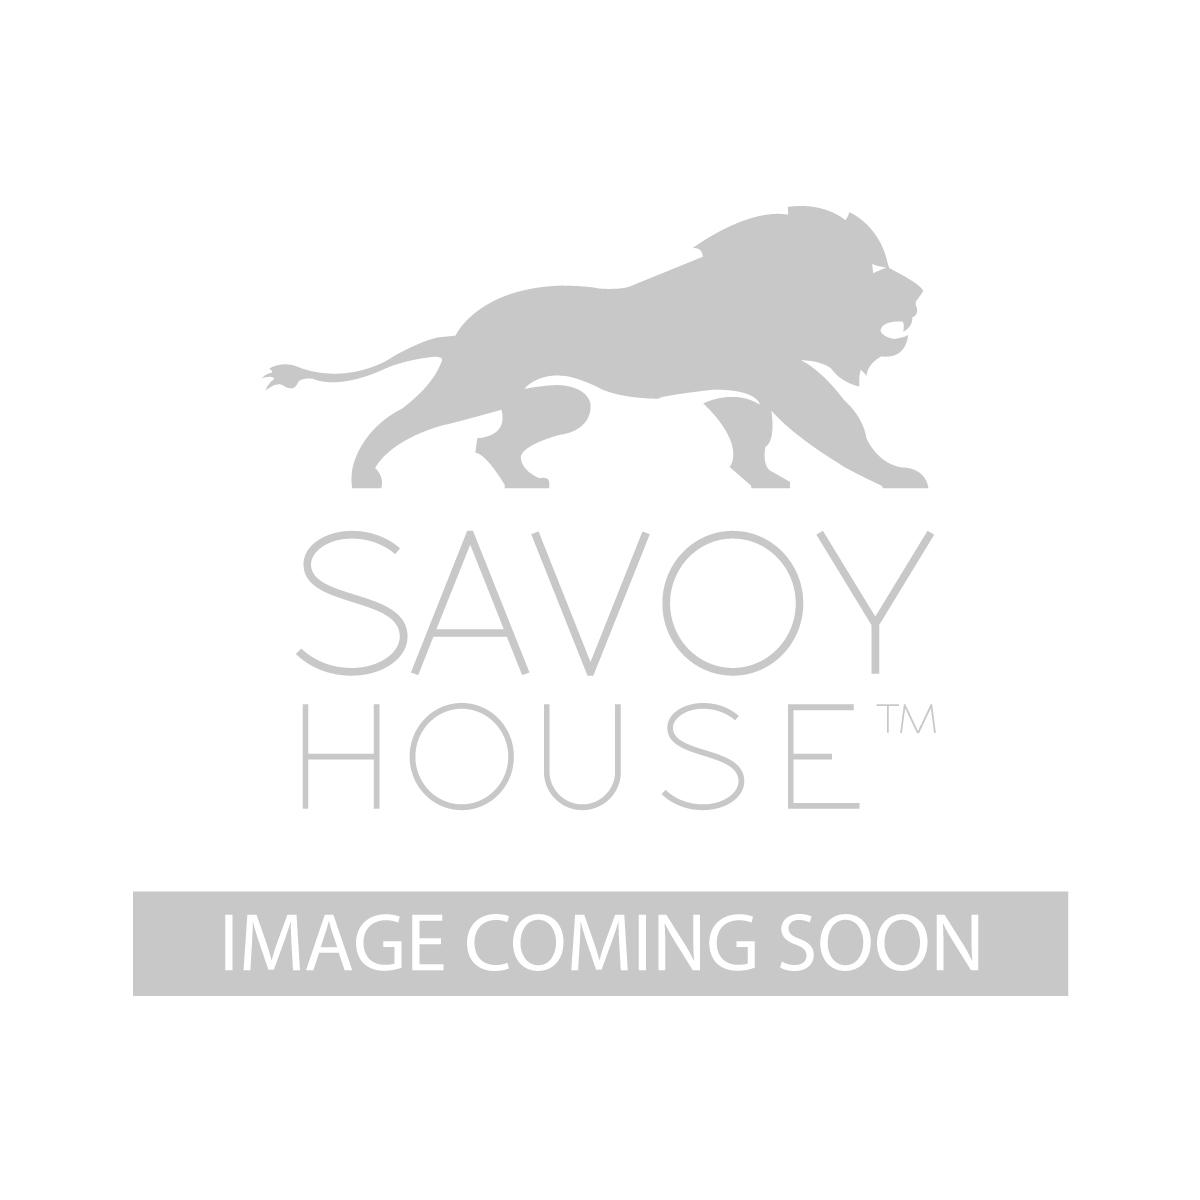 52 810 5WA 40 Monarch Ceiling Fan By Savoy House